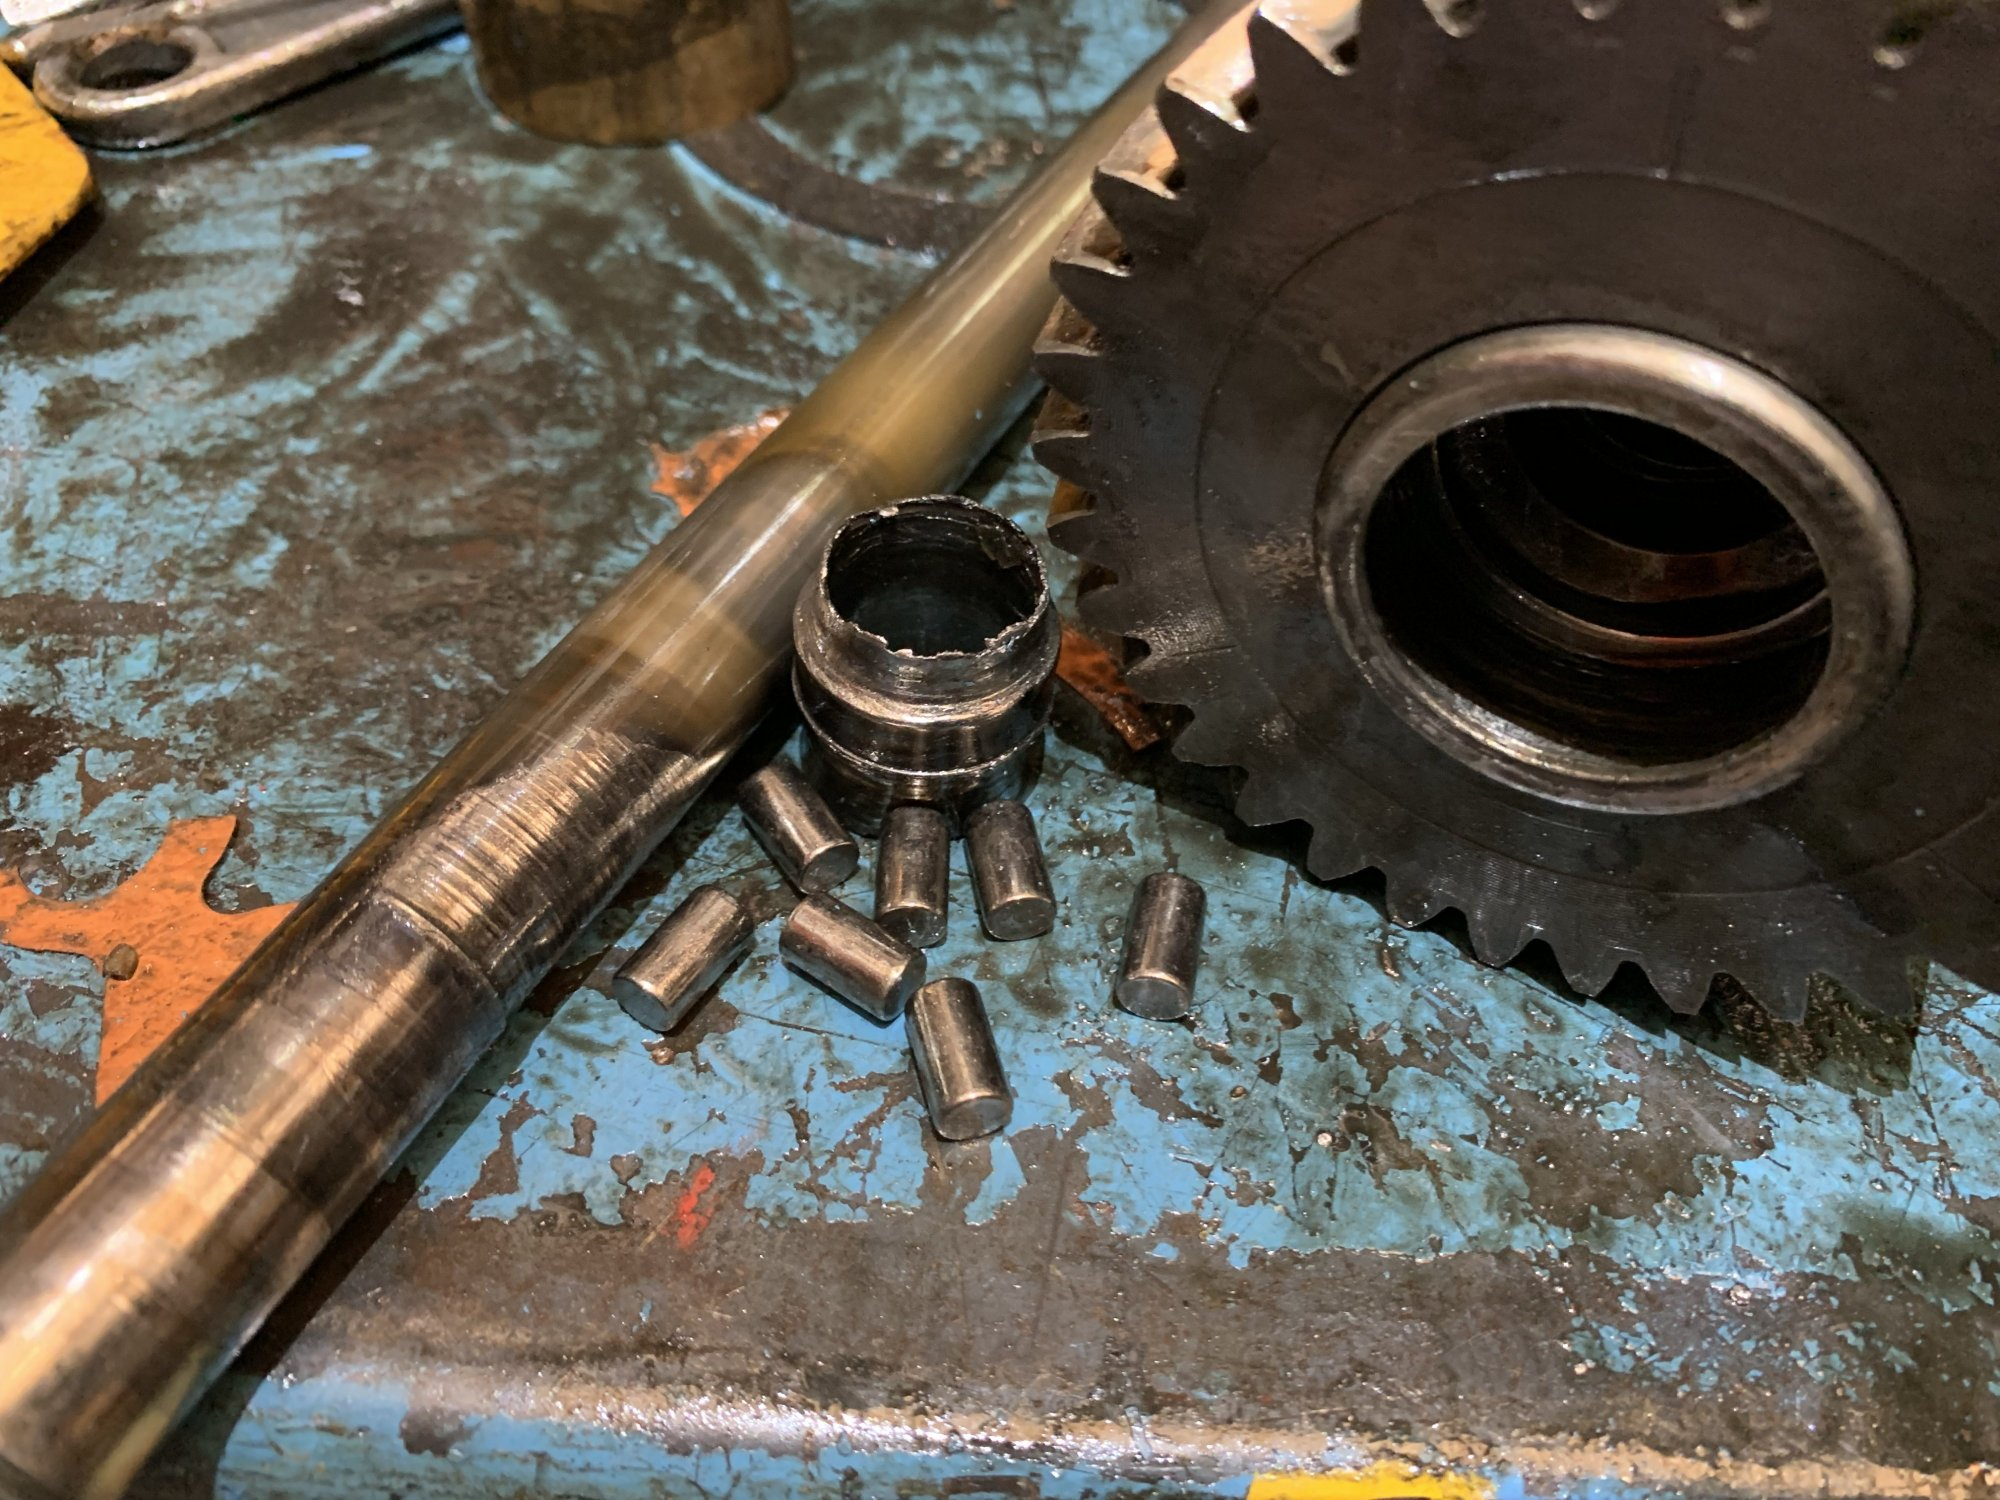 091.thumb.JPG.f559ccb1baec419def8b7ab01216cda2.JPG